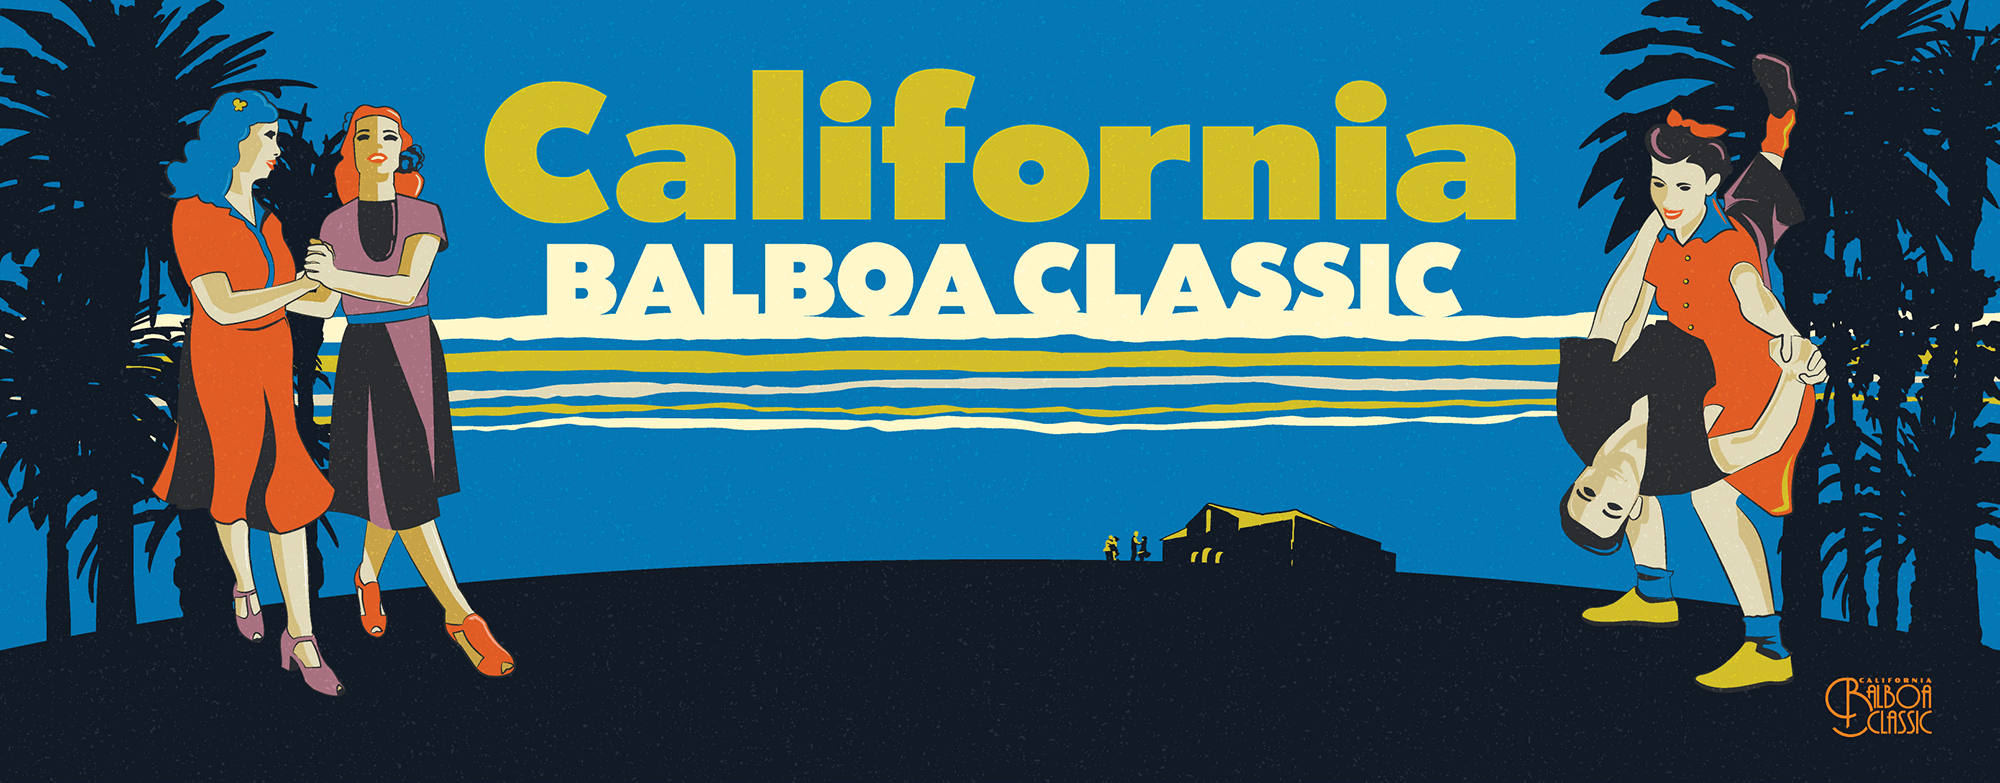 California Balboa Classic banner